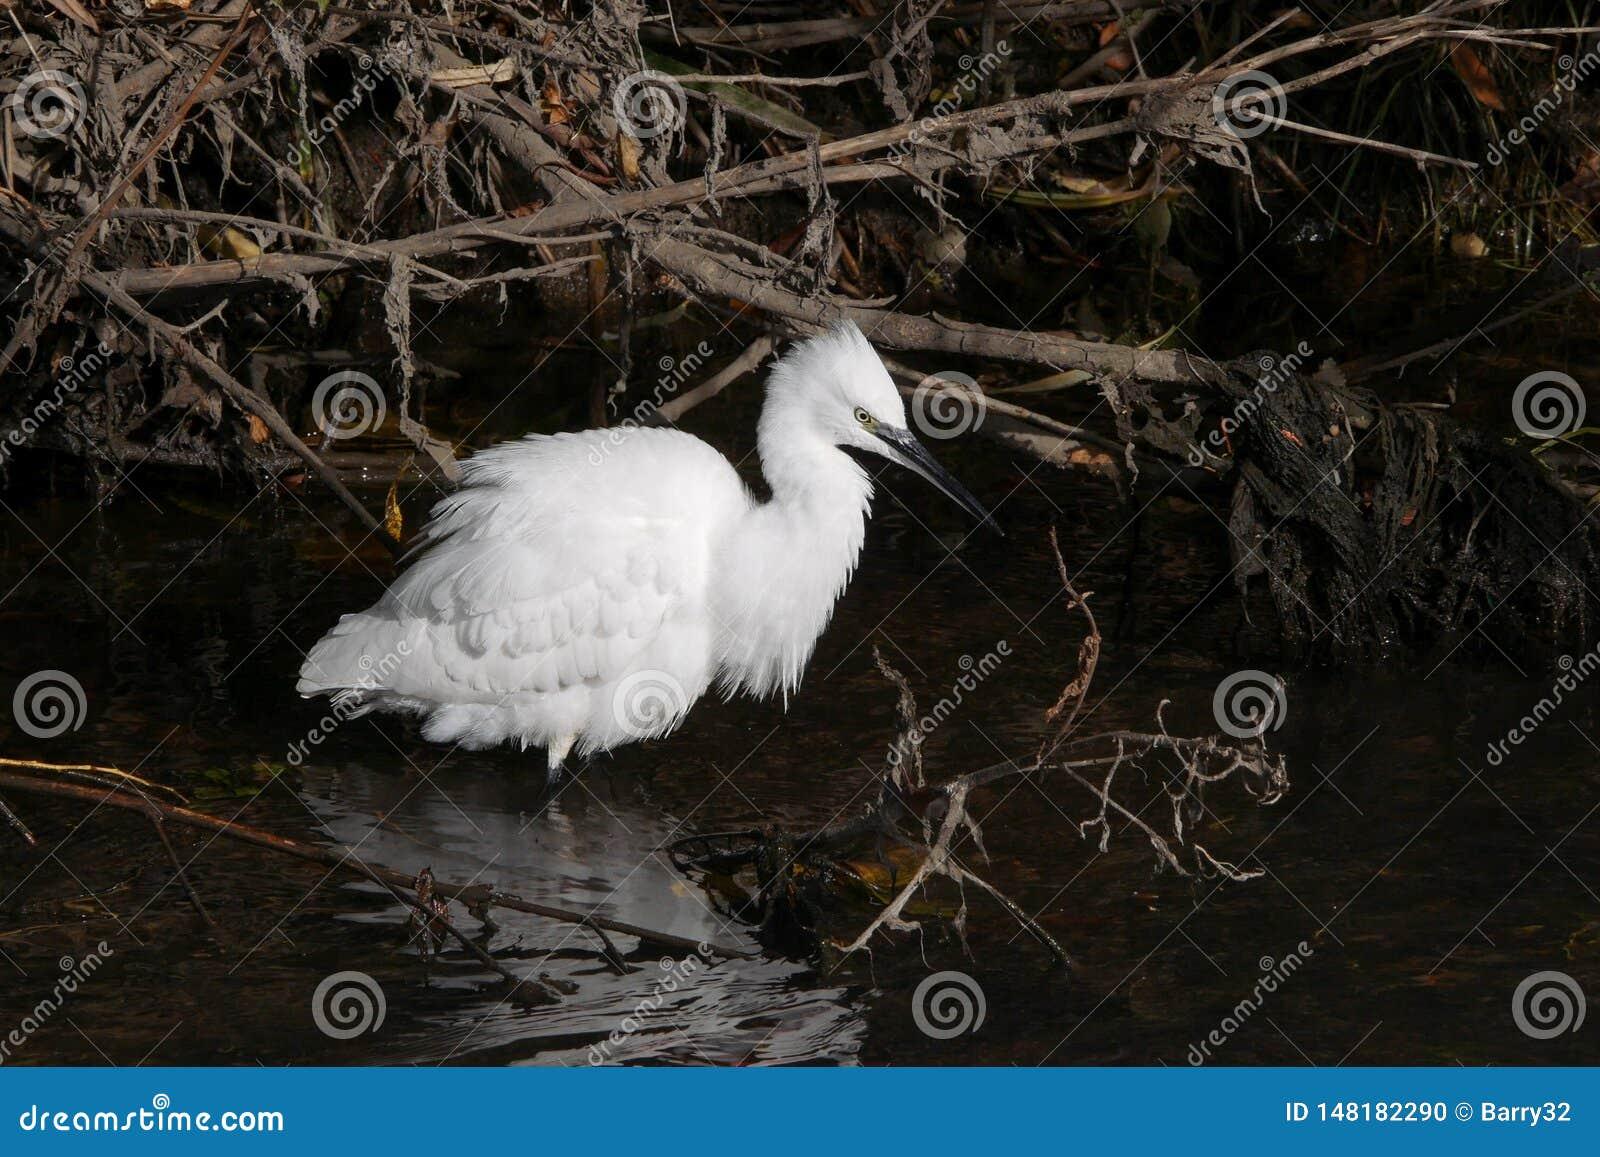 Little egret / Egretta garzetta wading in river with white plumage splayed out